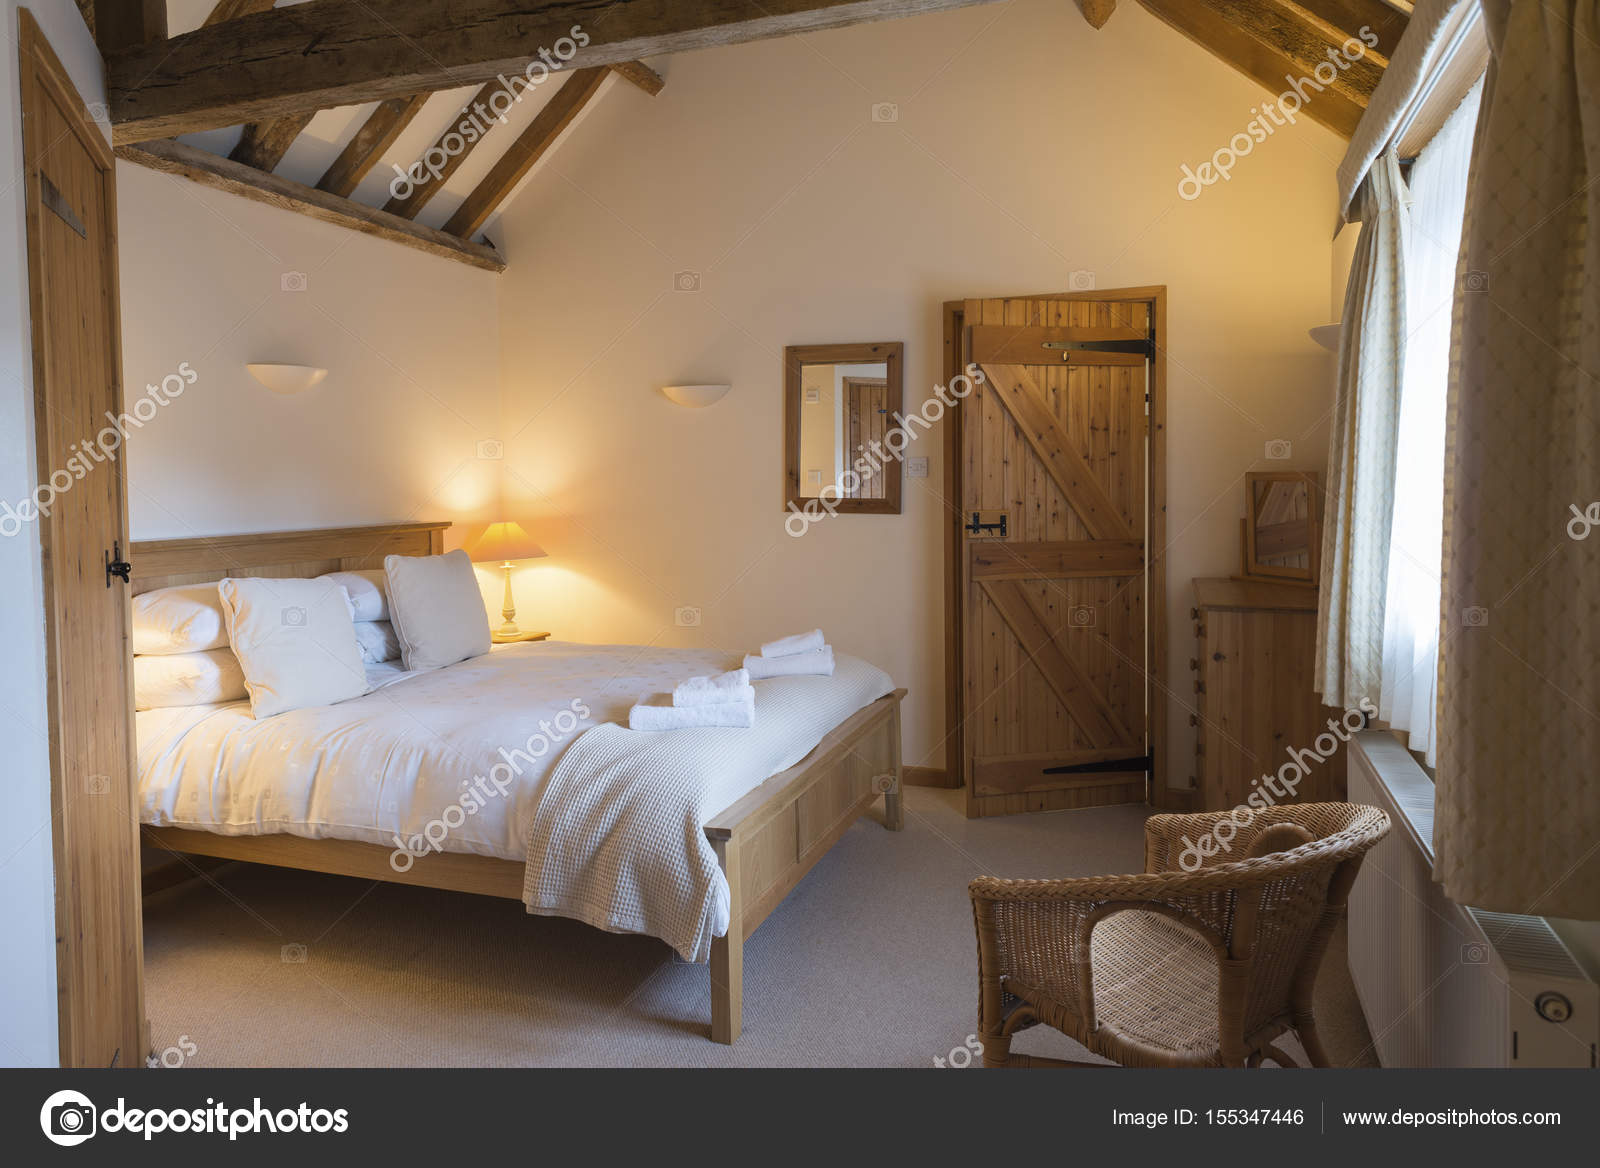 https://st3.depositphotos.com/5776754/15534/i/1600/depositphotos_155347446-stock-photo-fully-furnished-vacation-cottage-bedroom.jpg